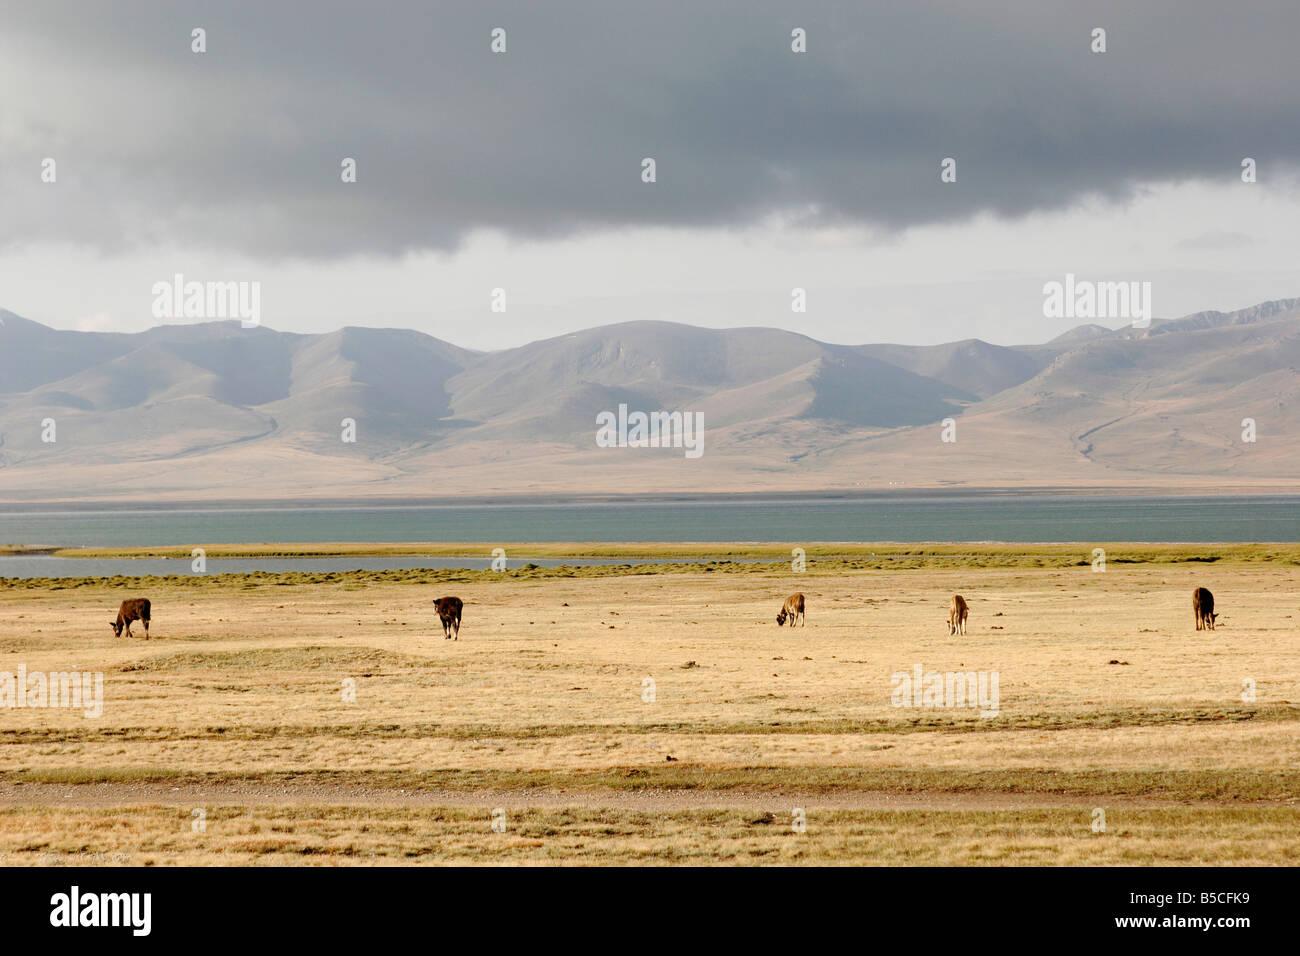 Pastures on lake Song-Kol, Tien Shan mountain, Kyrgyzstan, Central Asia - Stock Image